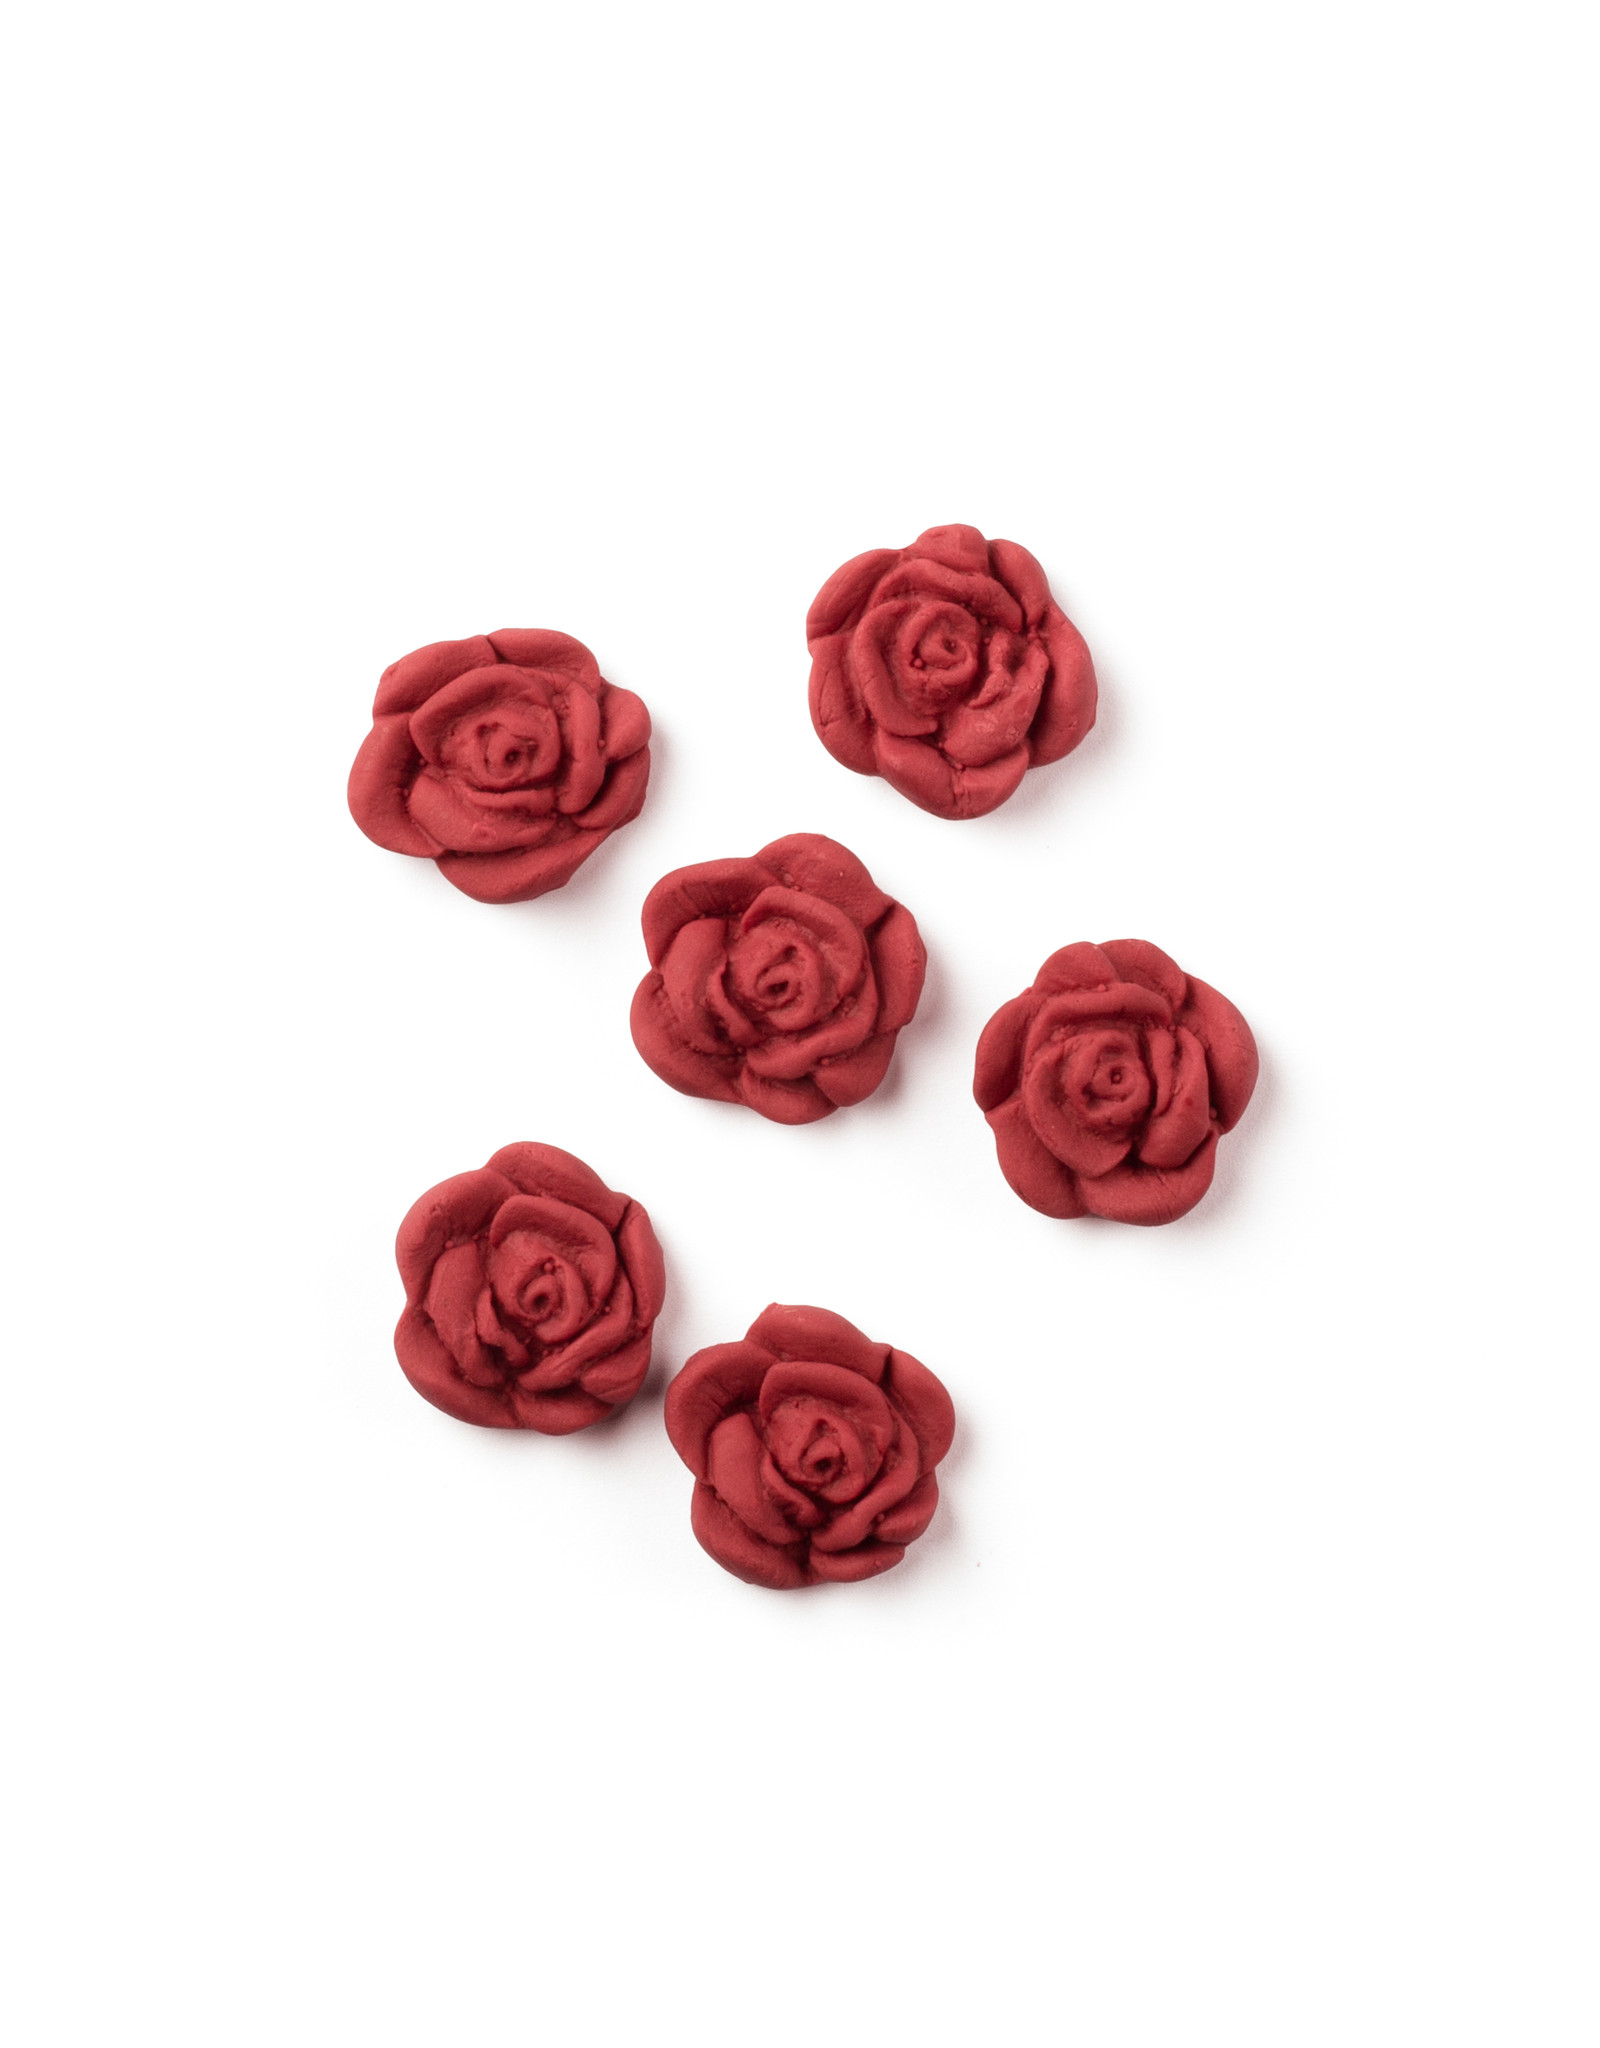 VOILA Home Bakery Voila Suikerdecoratie Rode Rozen - 22x 18 gram single